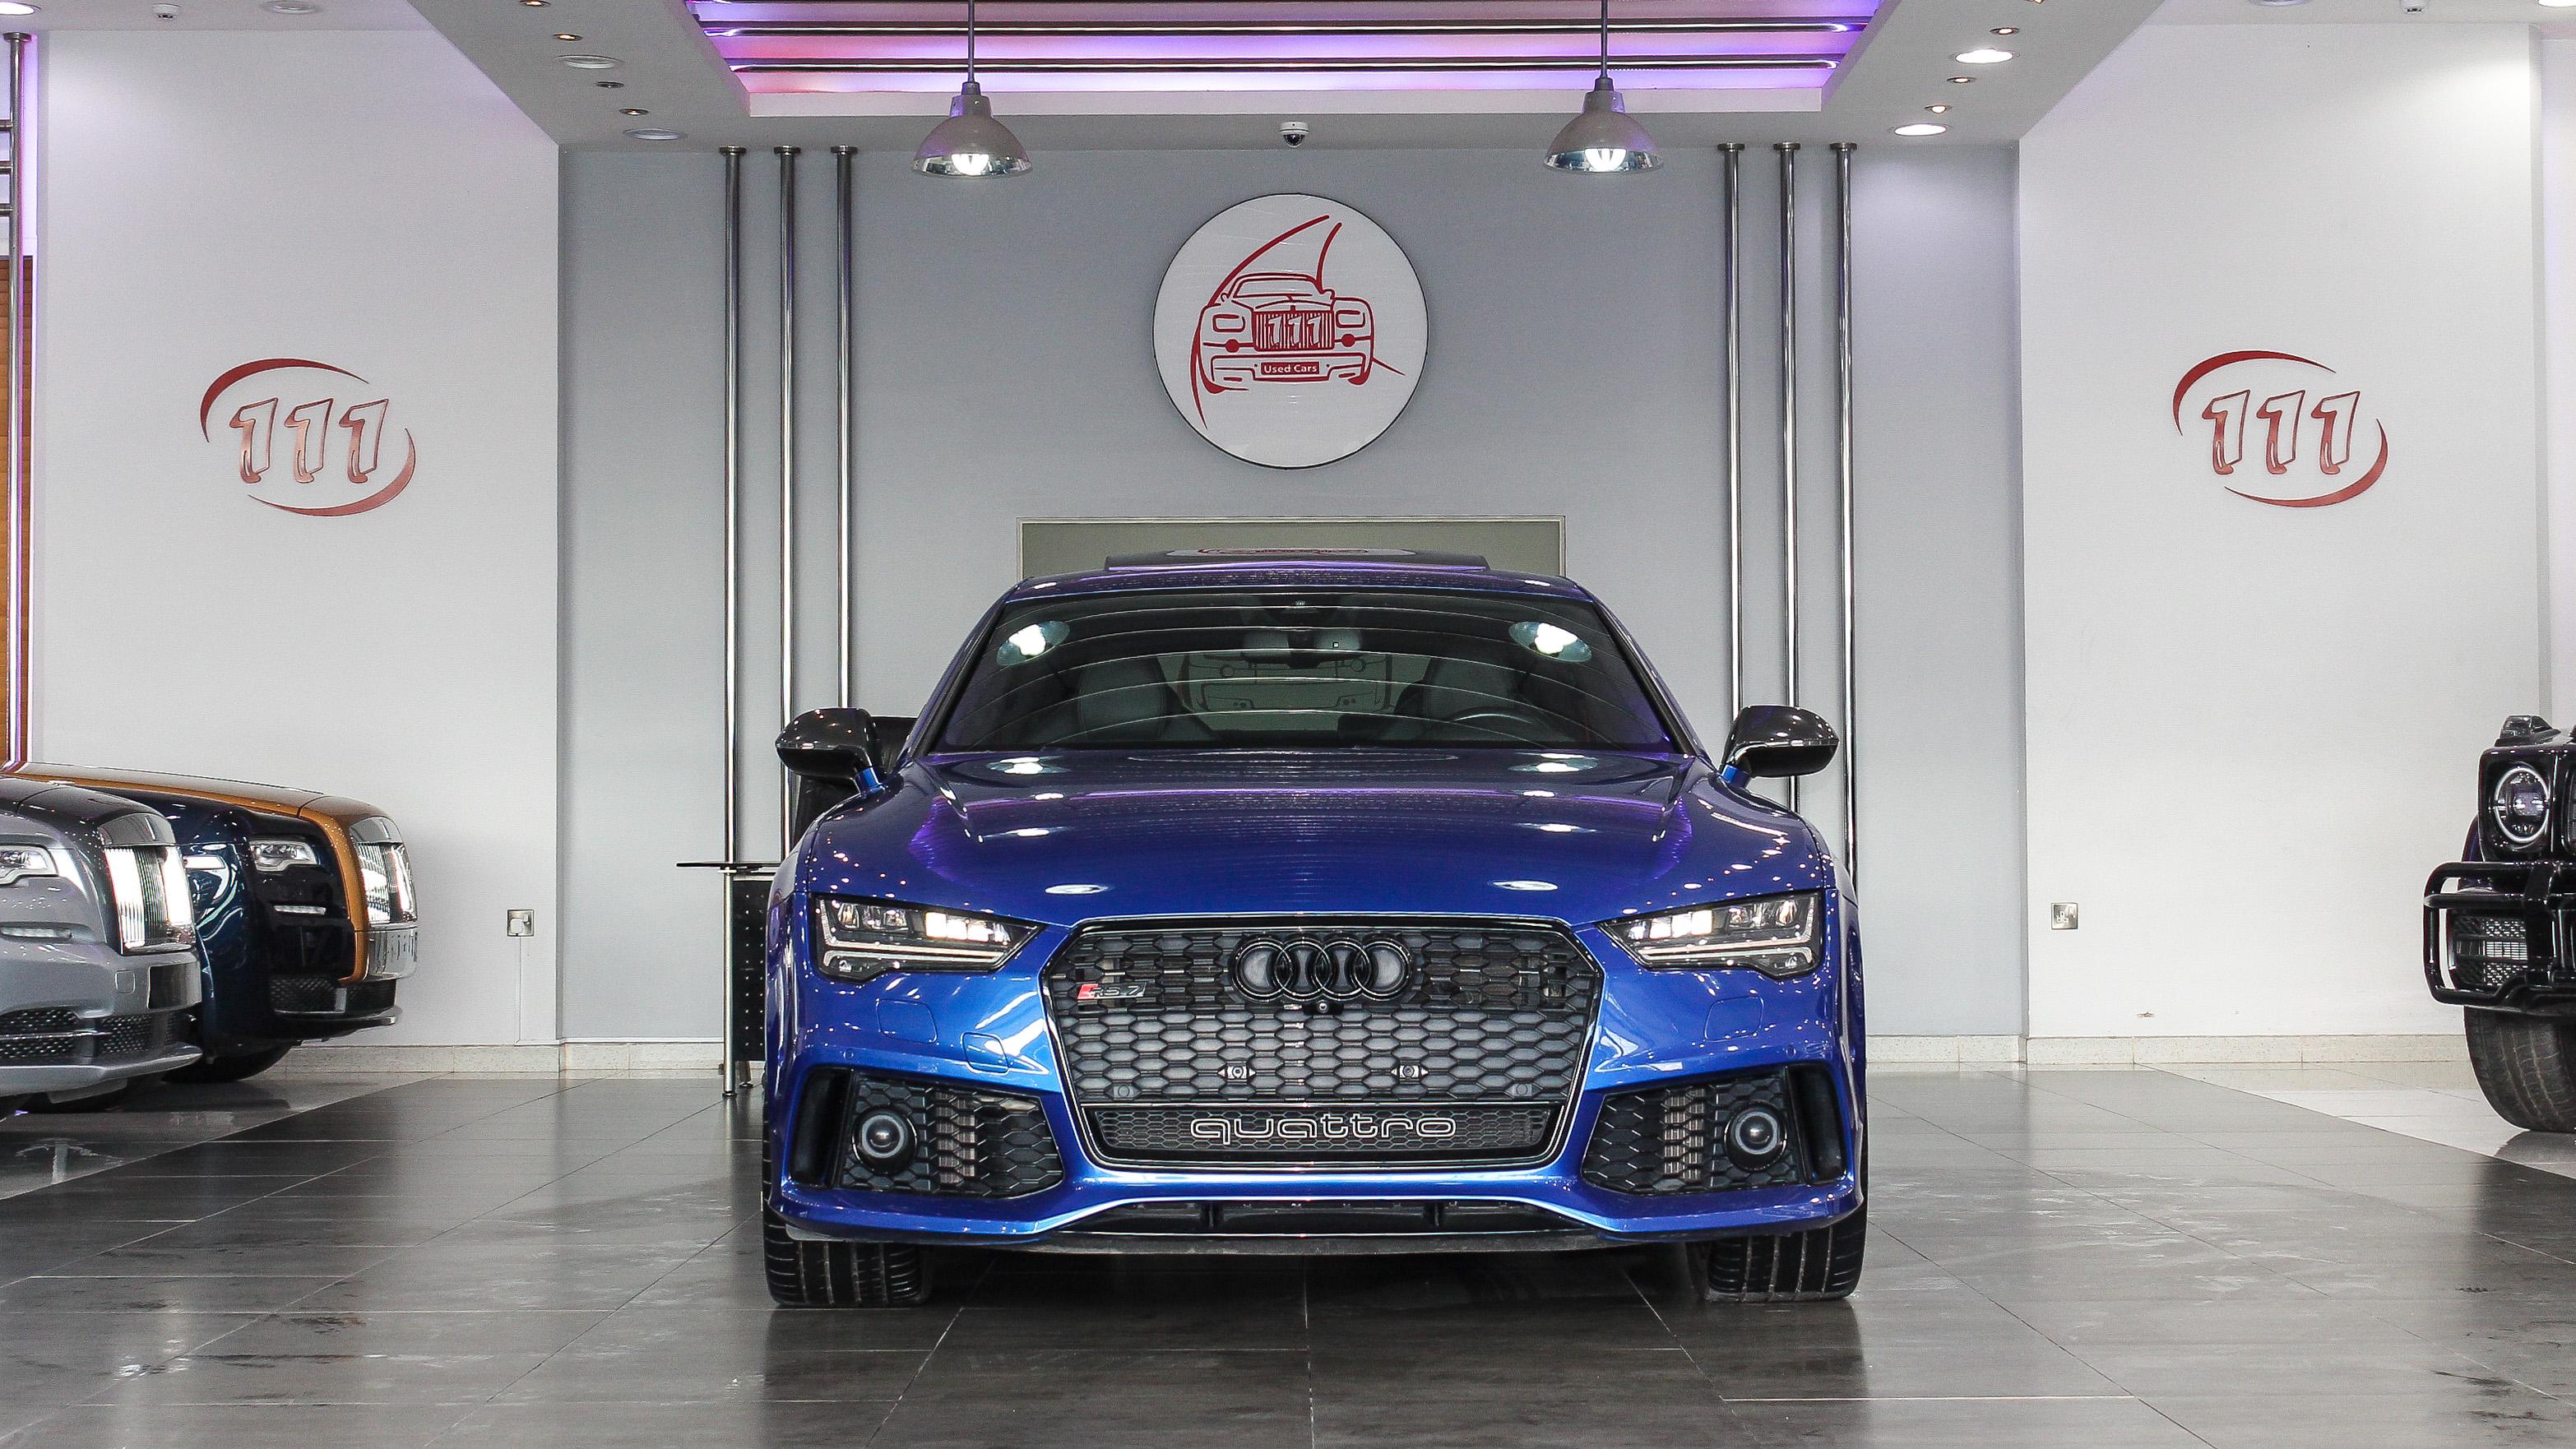 2016-Audi-RS7-Blue-Black-GCC-02.jpg